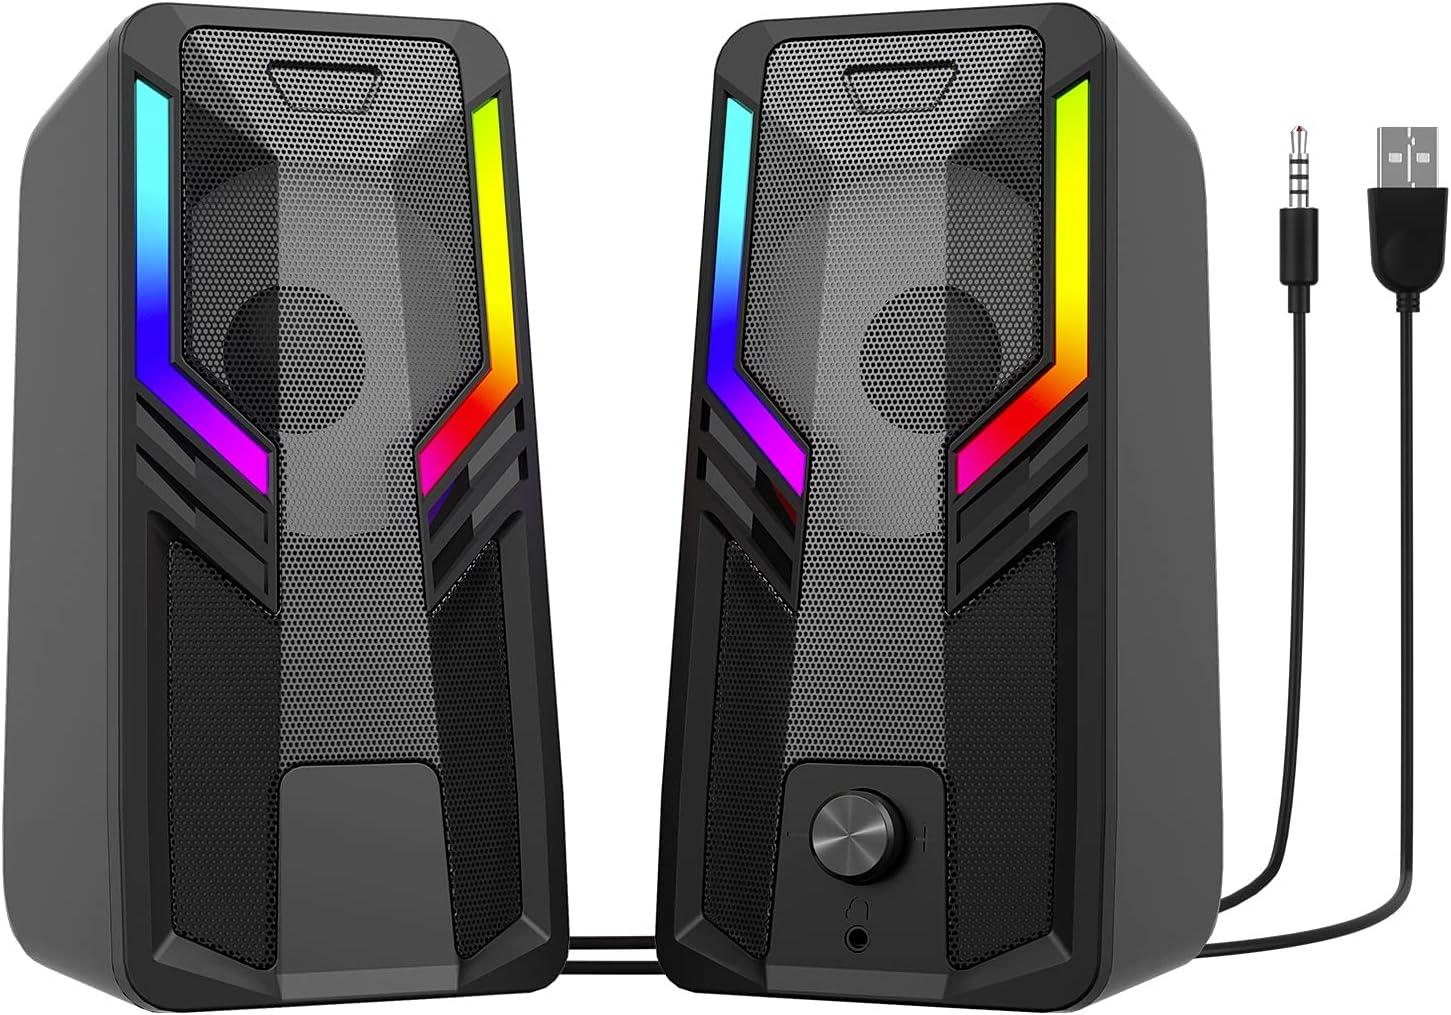 Selling SUDOTACK Gaming Computer Speakers Stereo Multim Elegant 10W USB-Powered